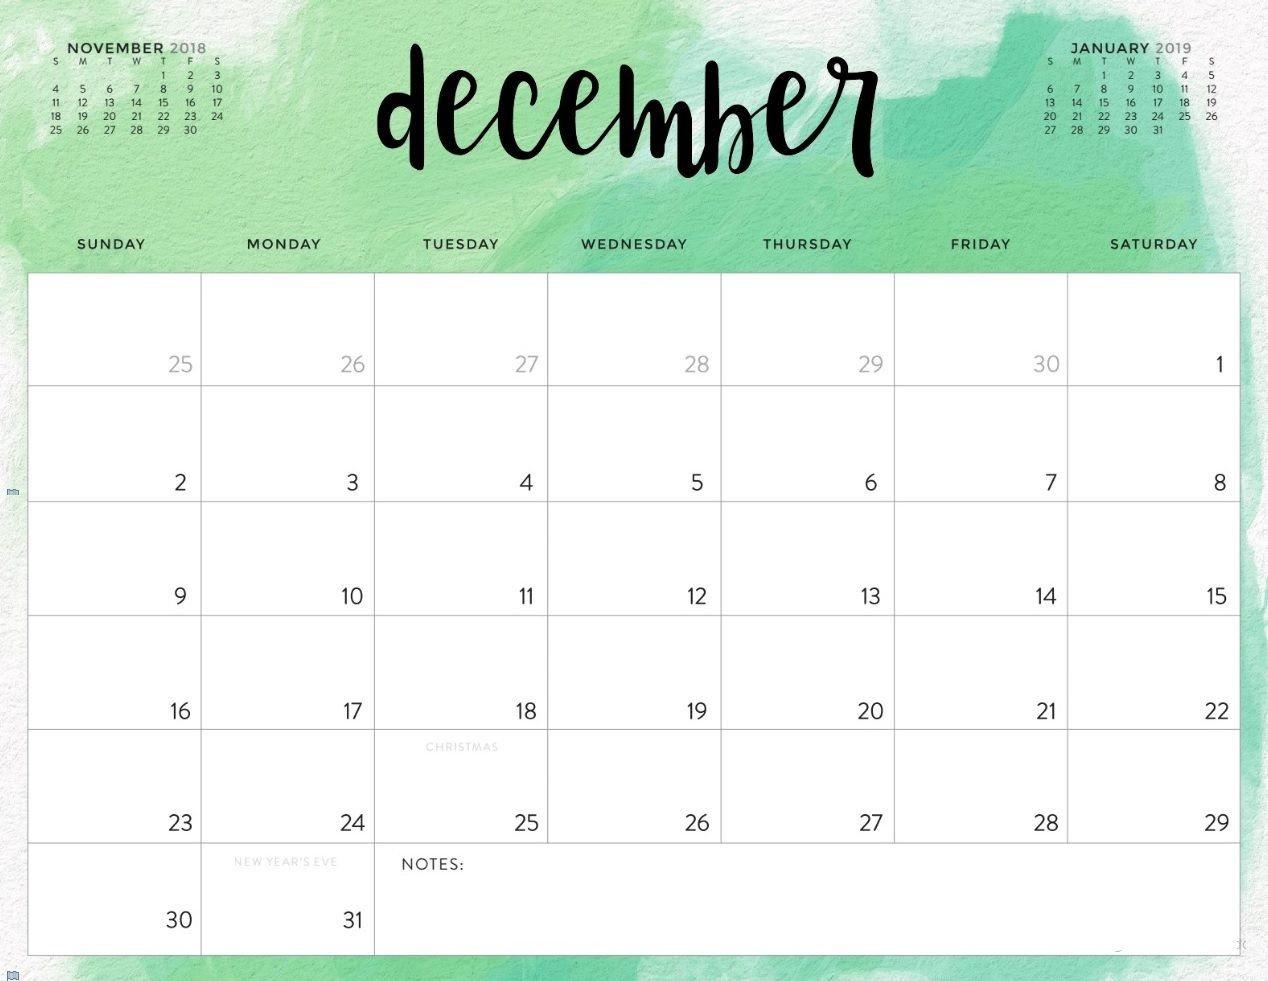 Custom Calendar For Business – Marry Steven – Medium Calendar I Can Download And Edit